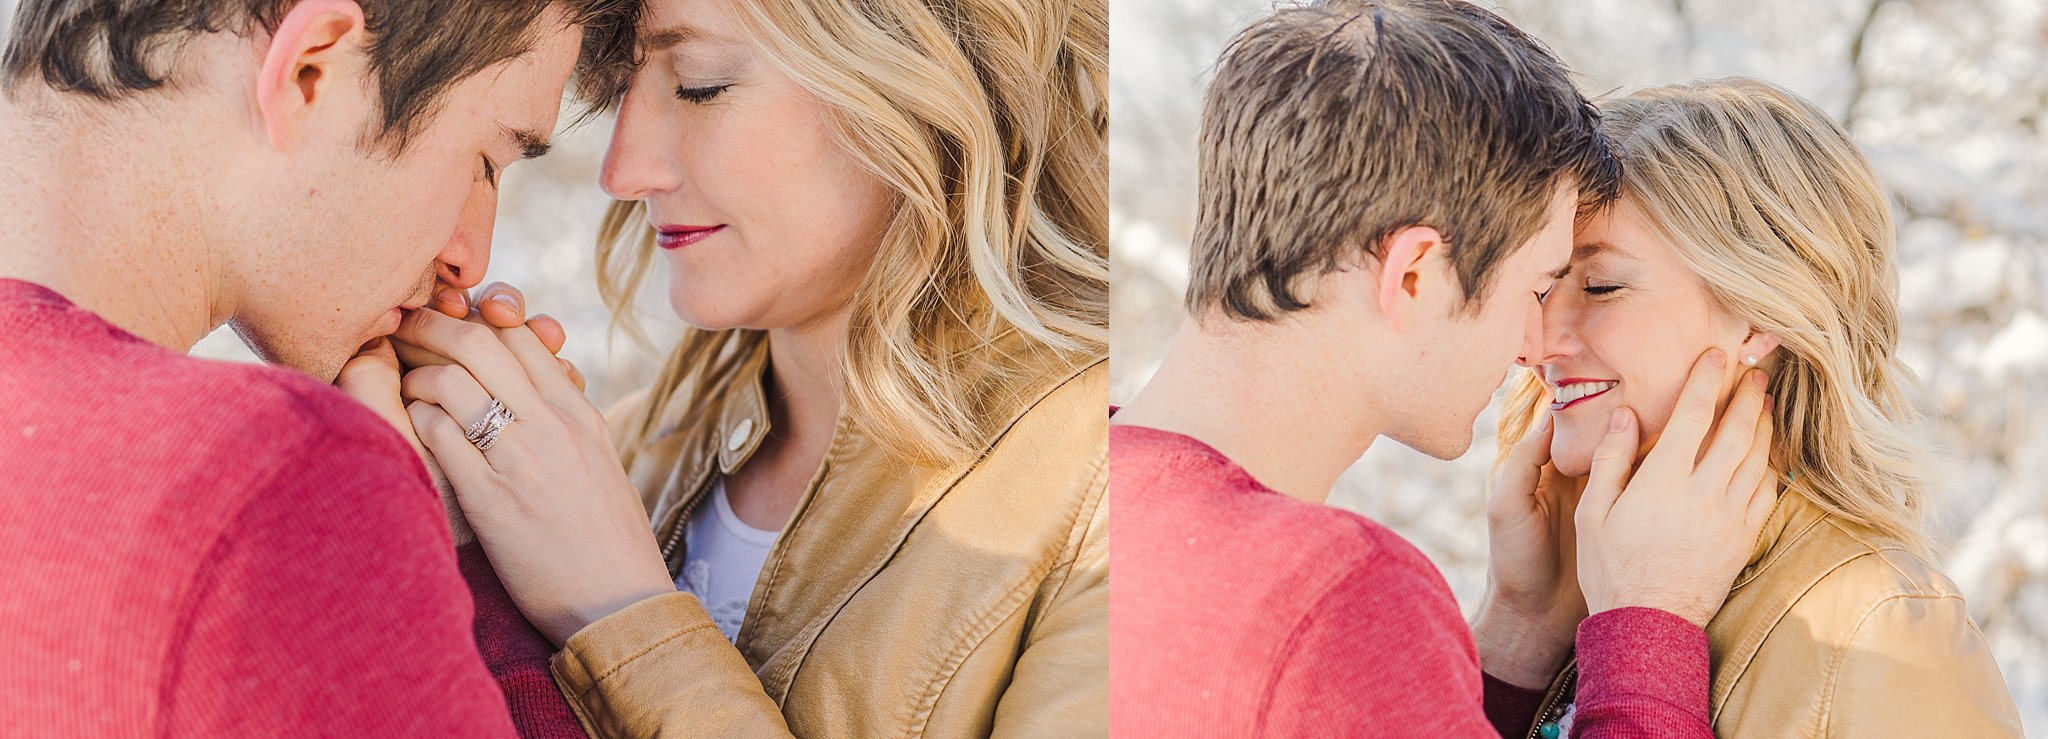 Salt Lake City,Utah,Wedding,couple,engagement photos,layton,outdoor,winter,